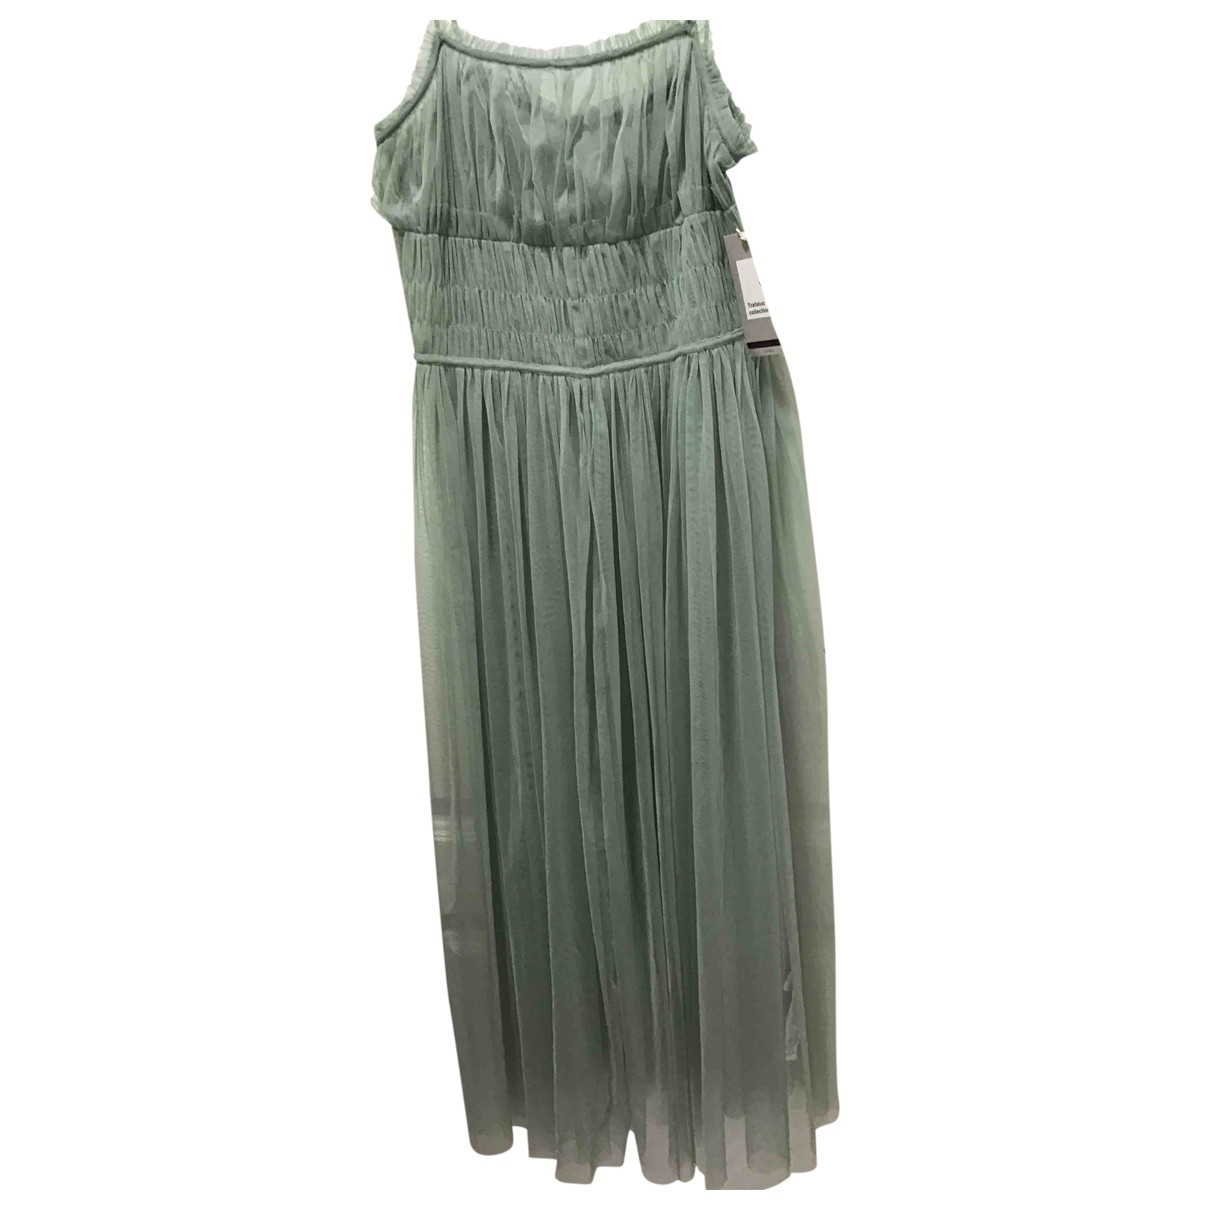 Zara \N Green dress for Women 32 FR